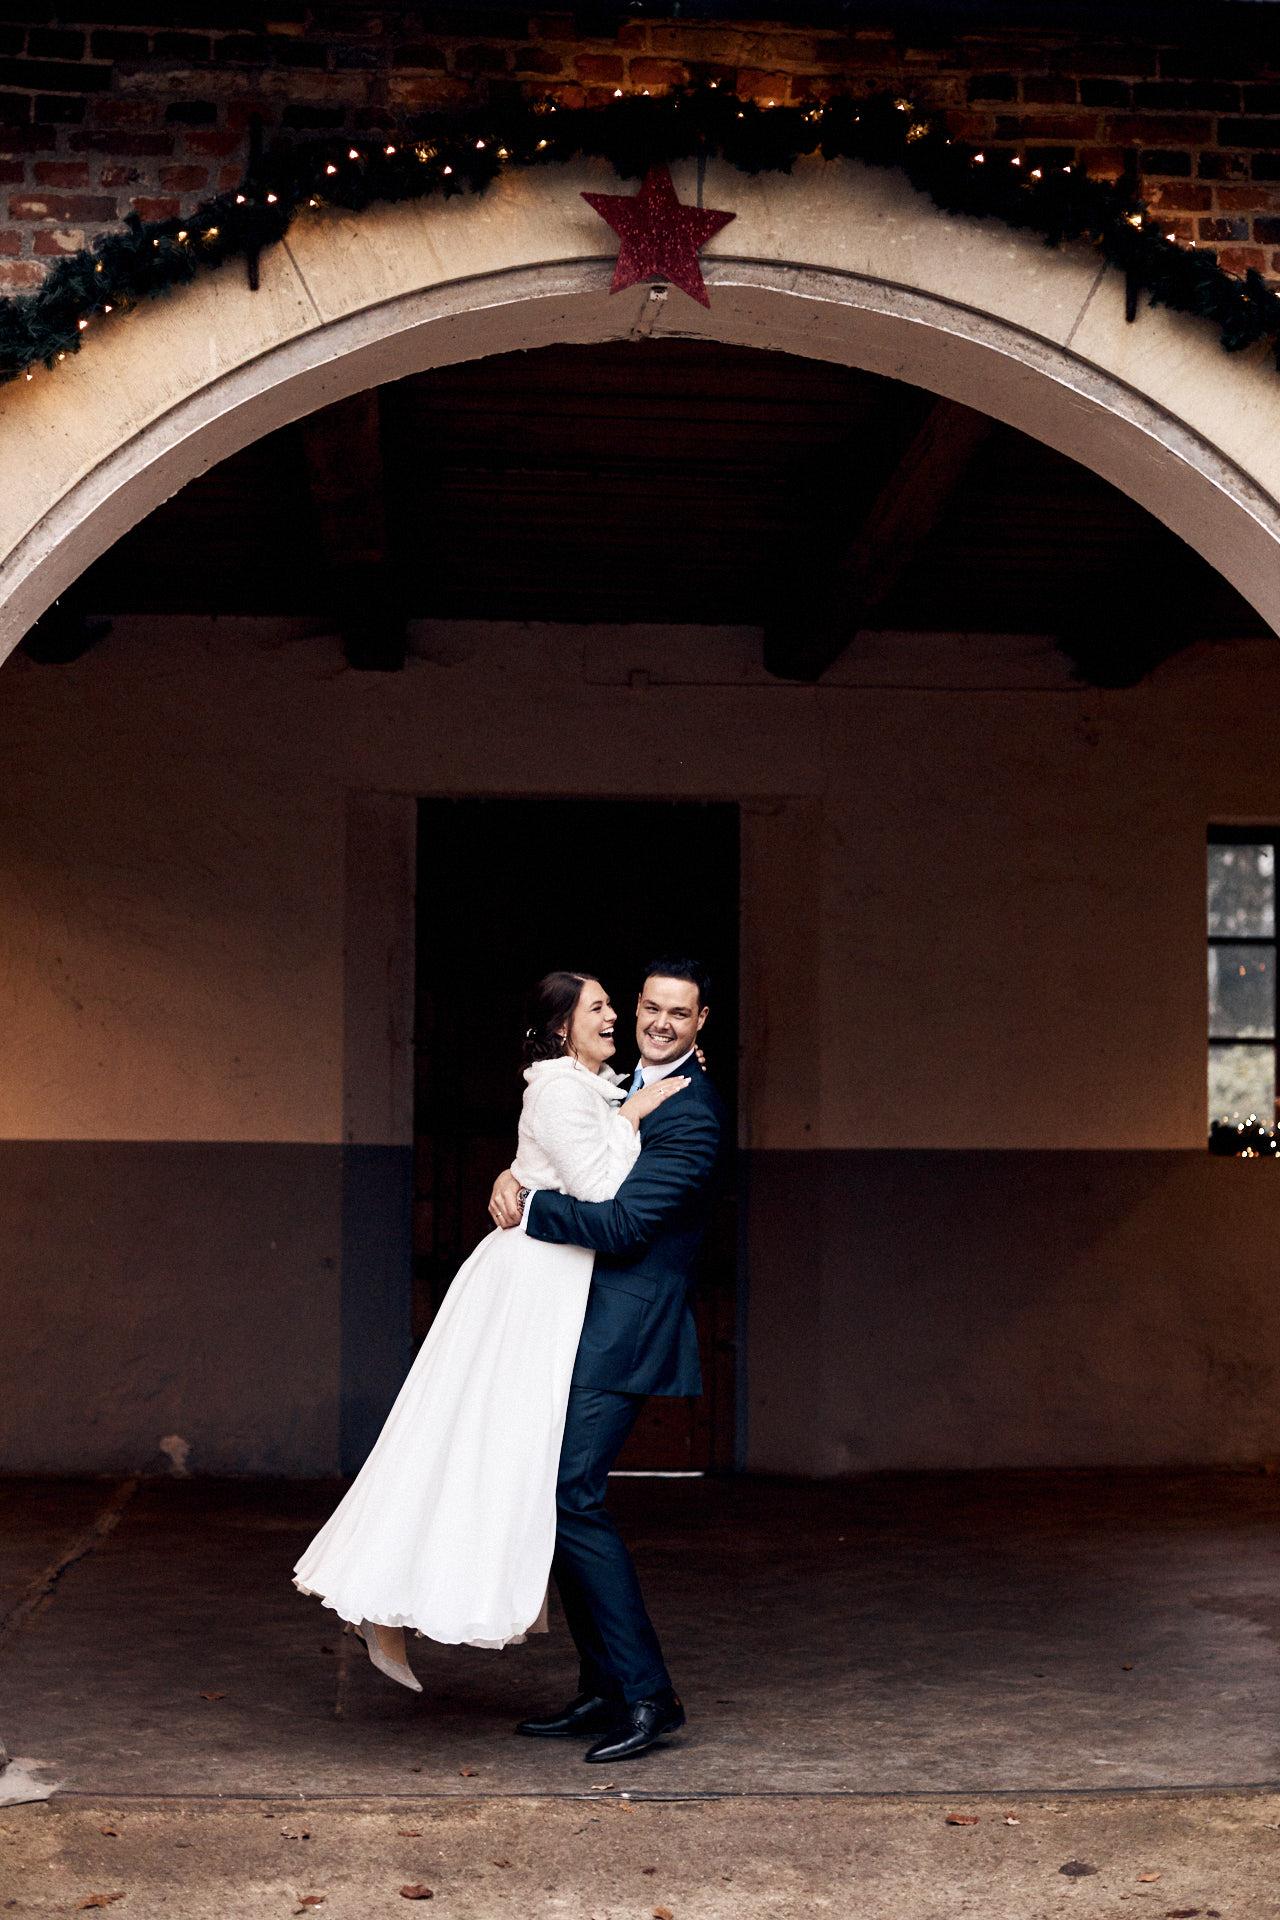 2019-12-20 Laura & Robin - Alena and Daniel Weddings 0479